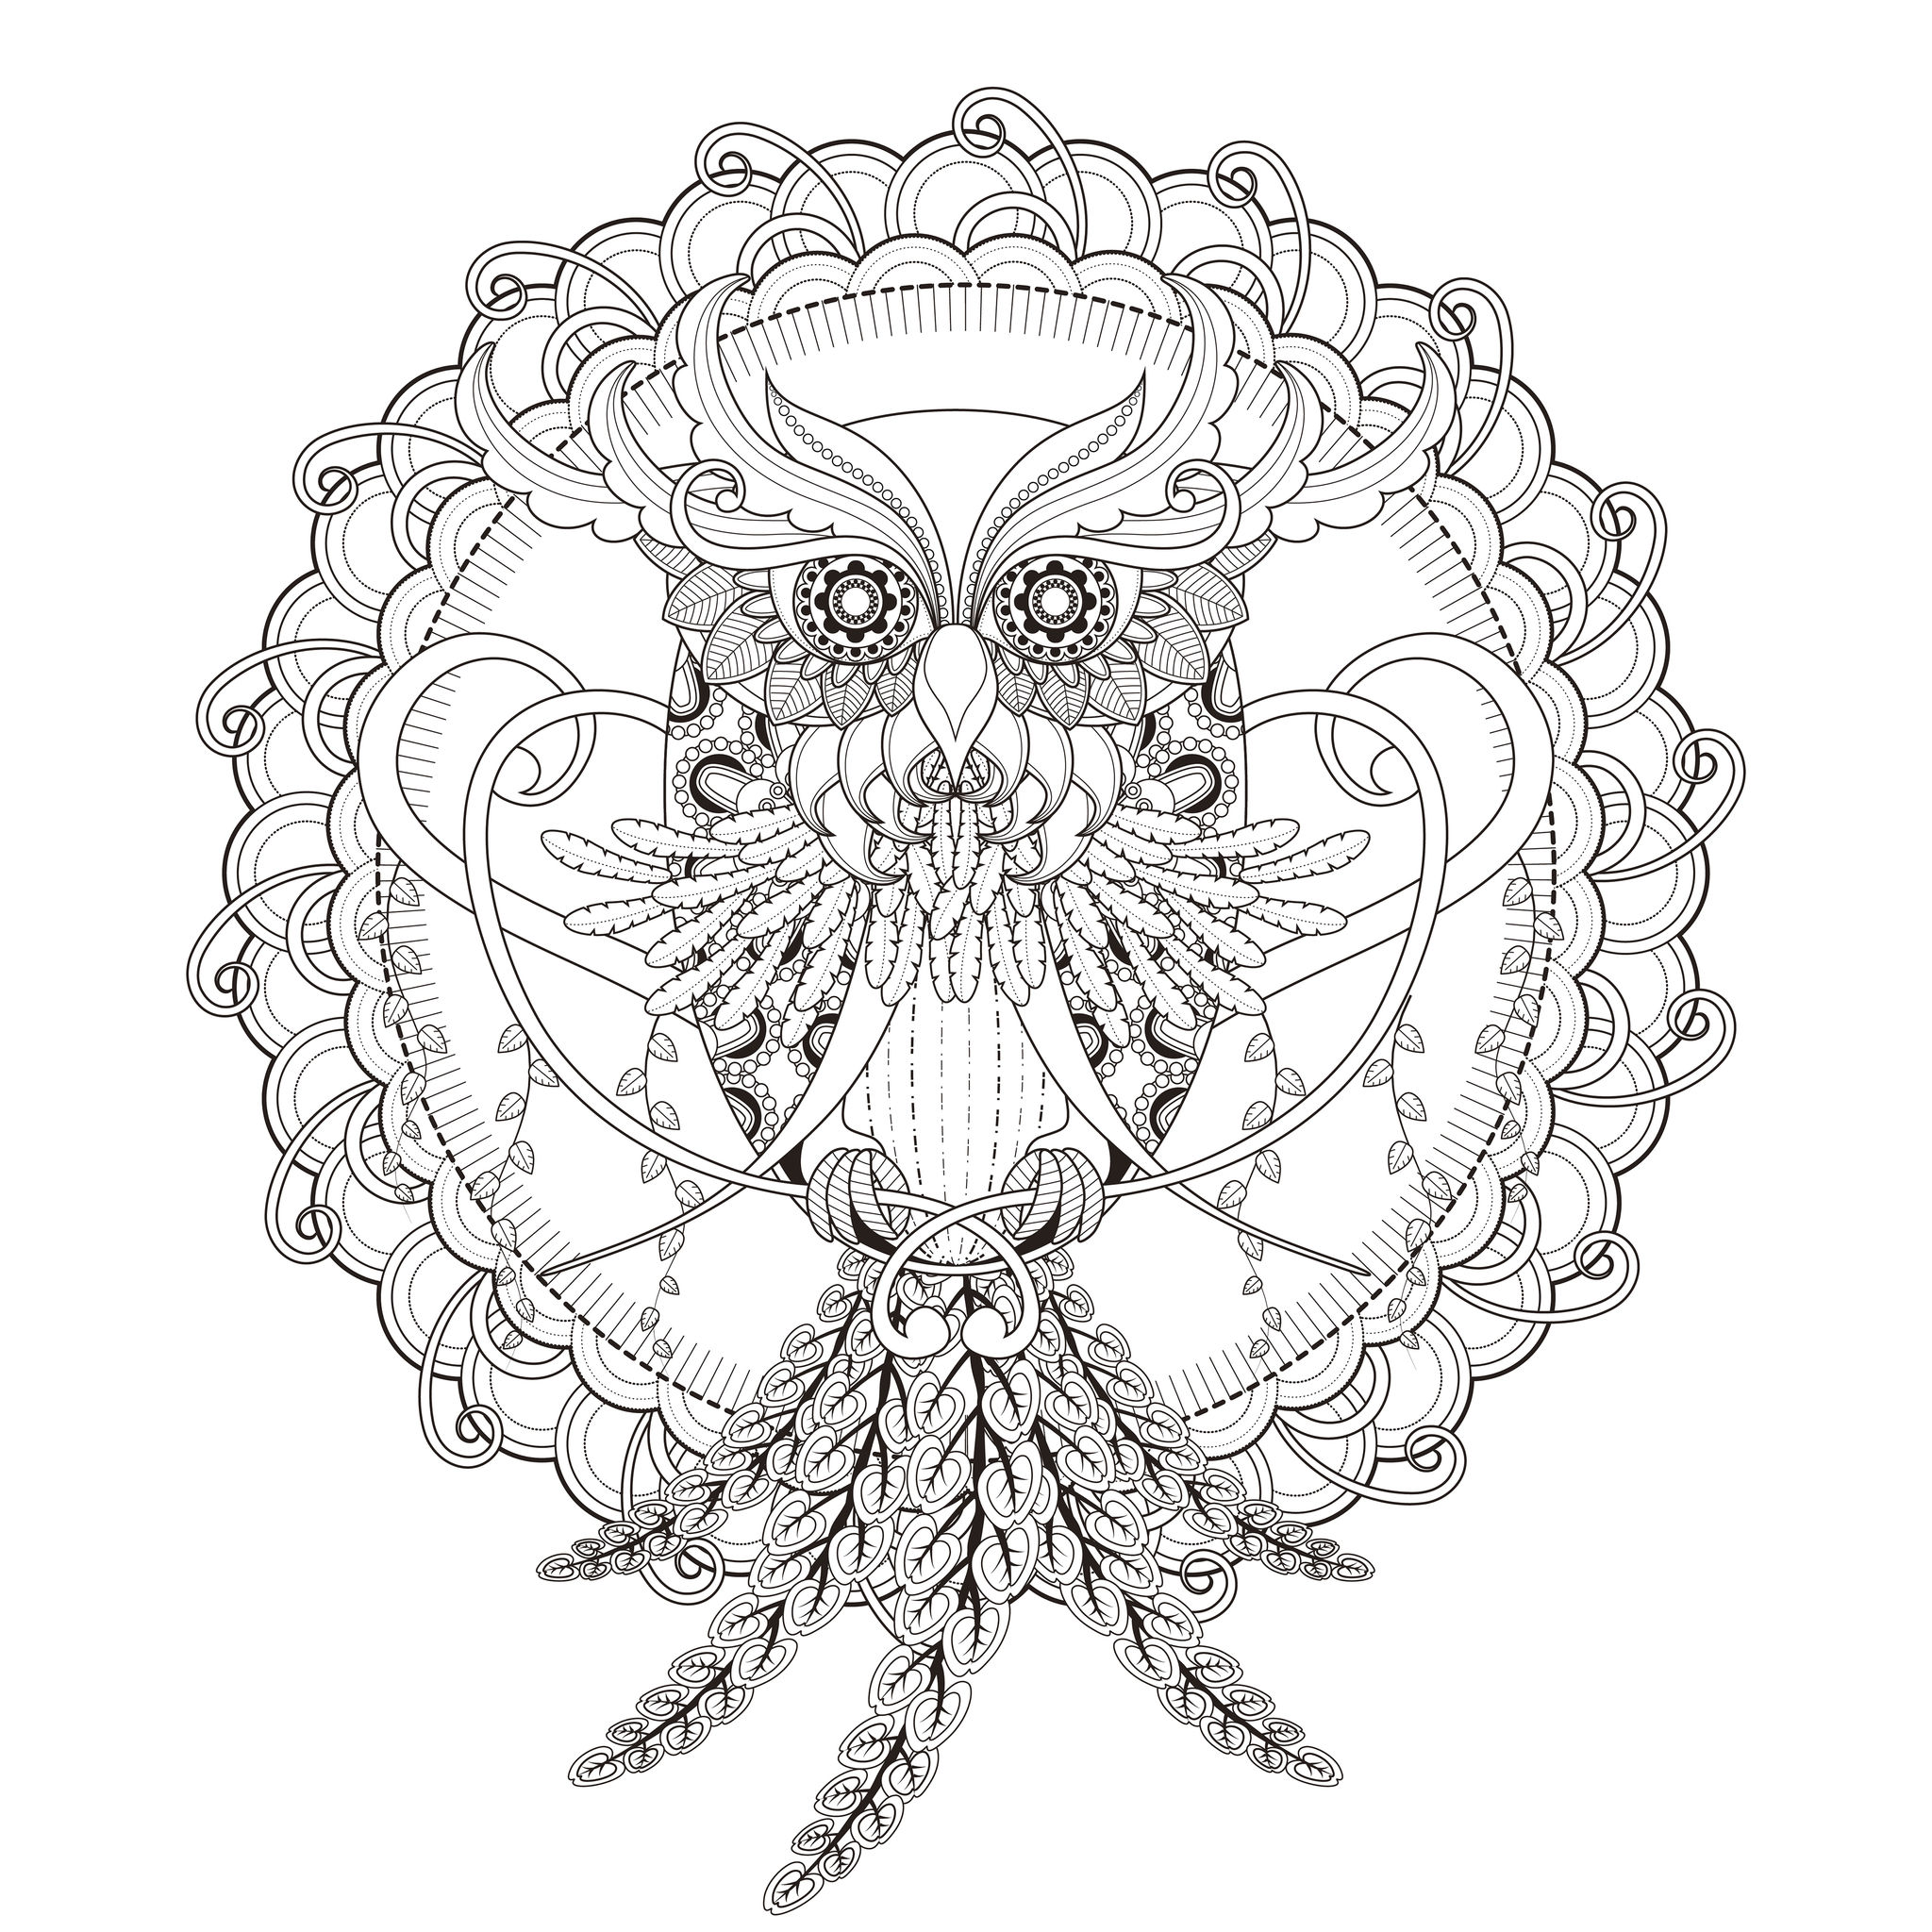 Mandala chouette